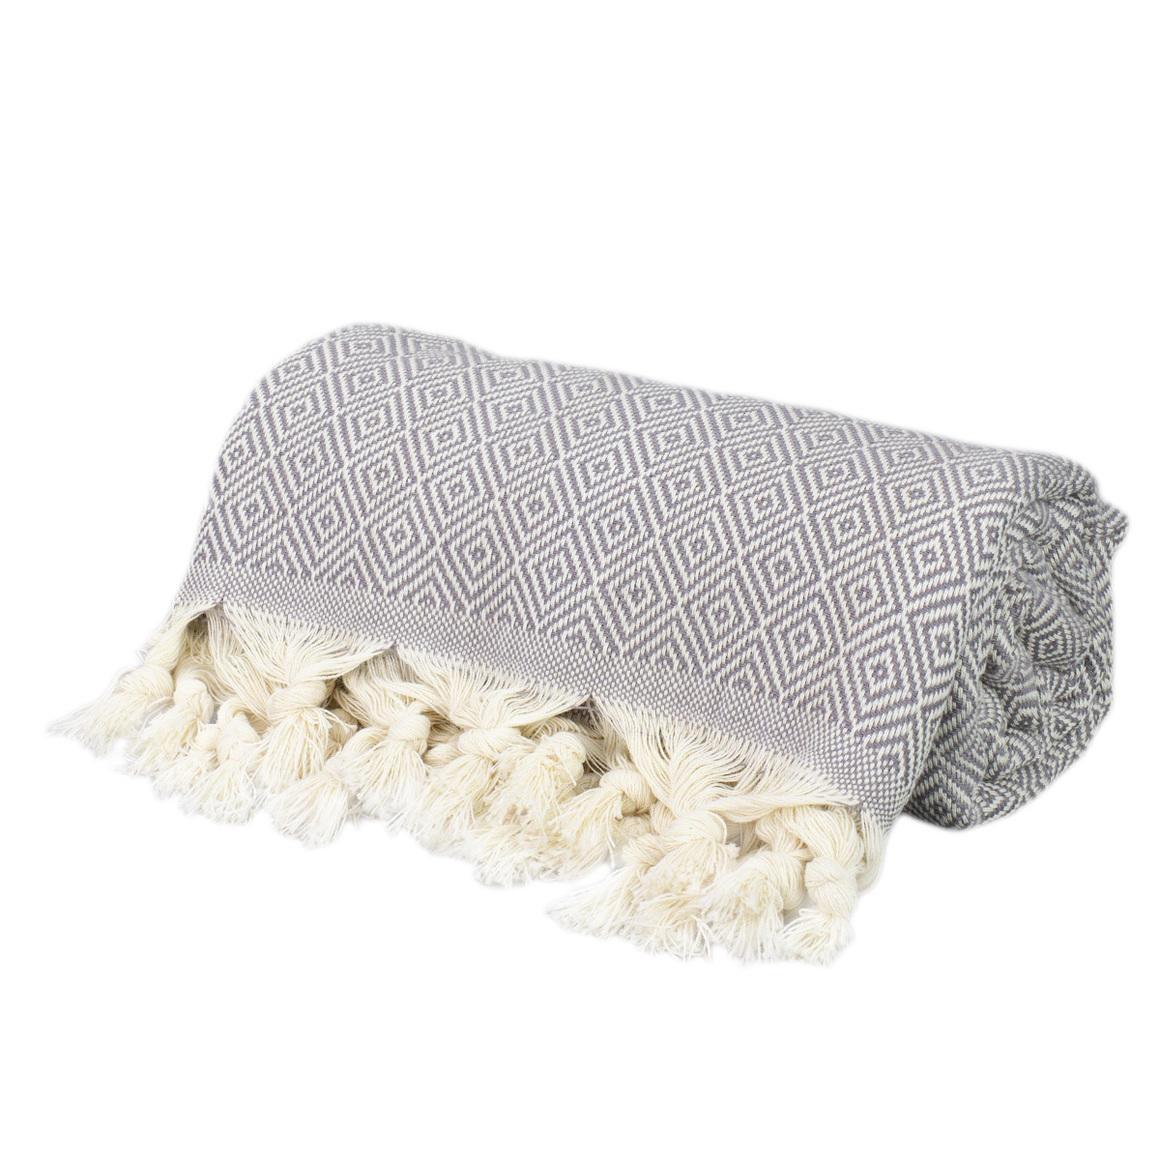 THICK TURKISH TOWEL FULL DARK GREY | Trada Marketplace